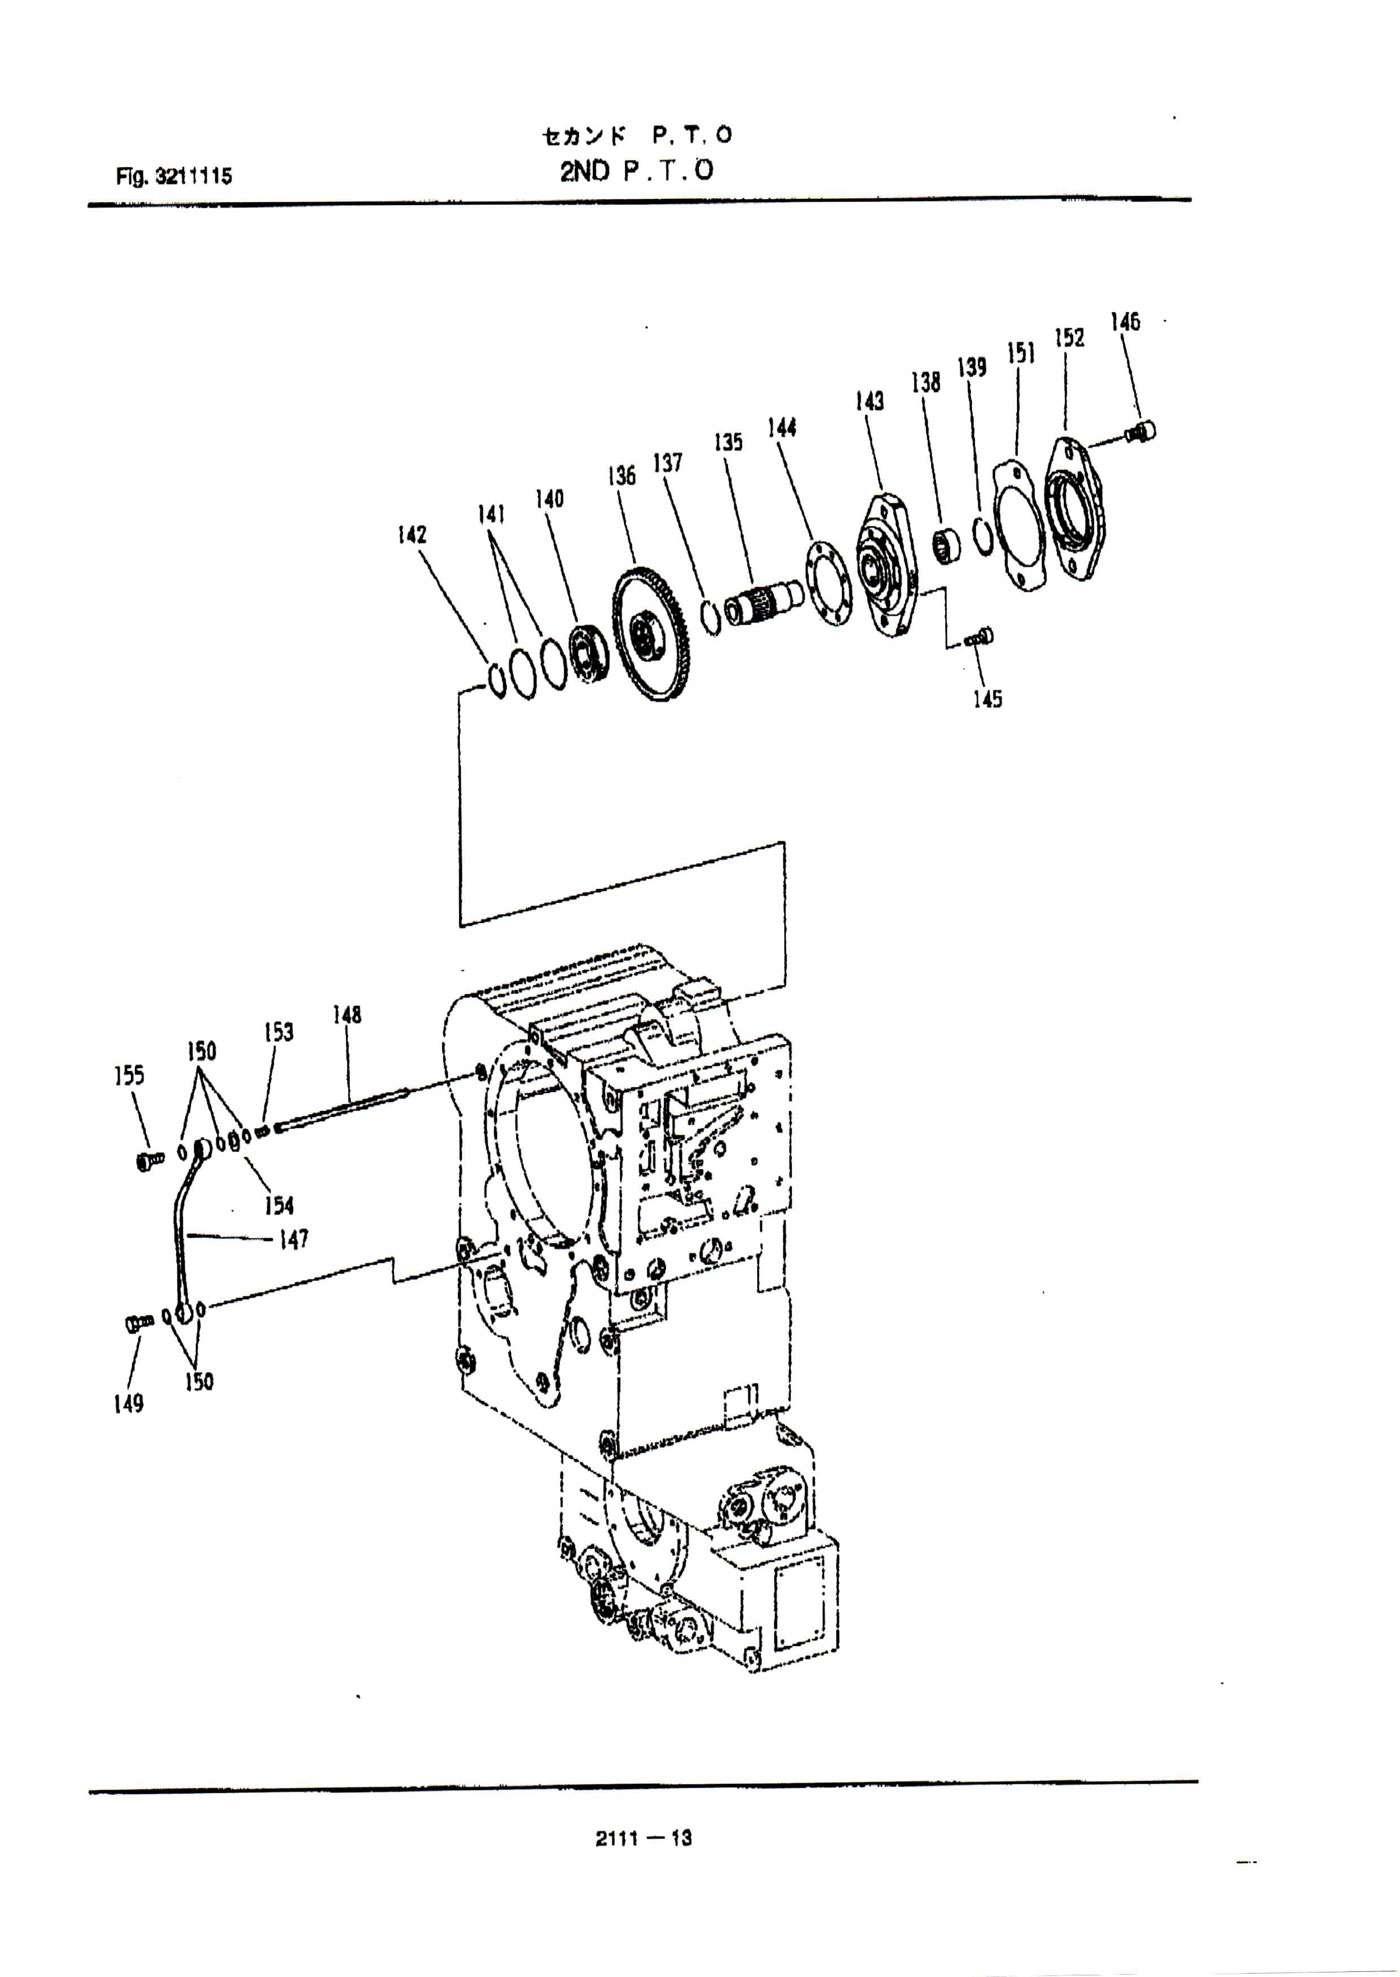 Parts for SHIBAURA FL335